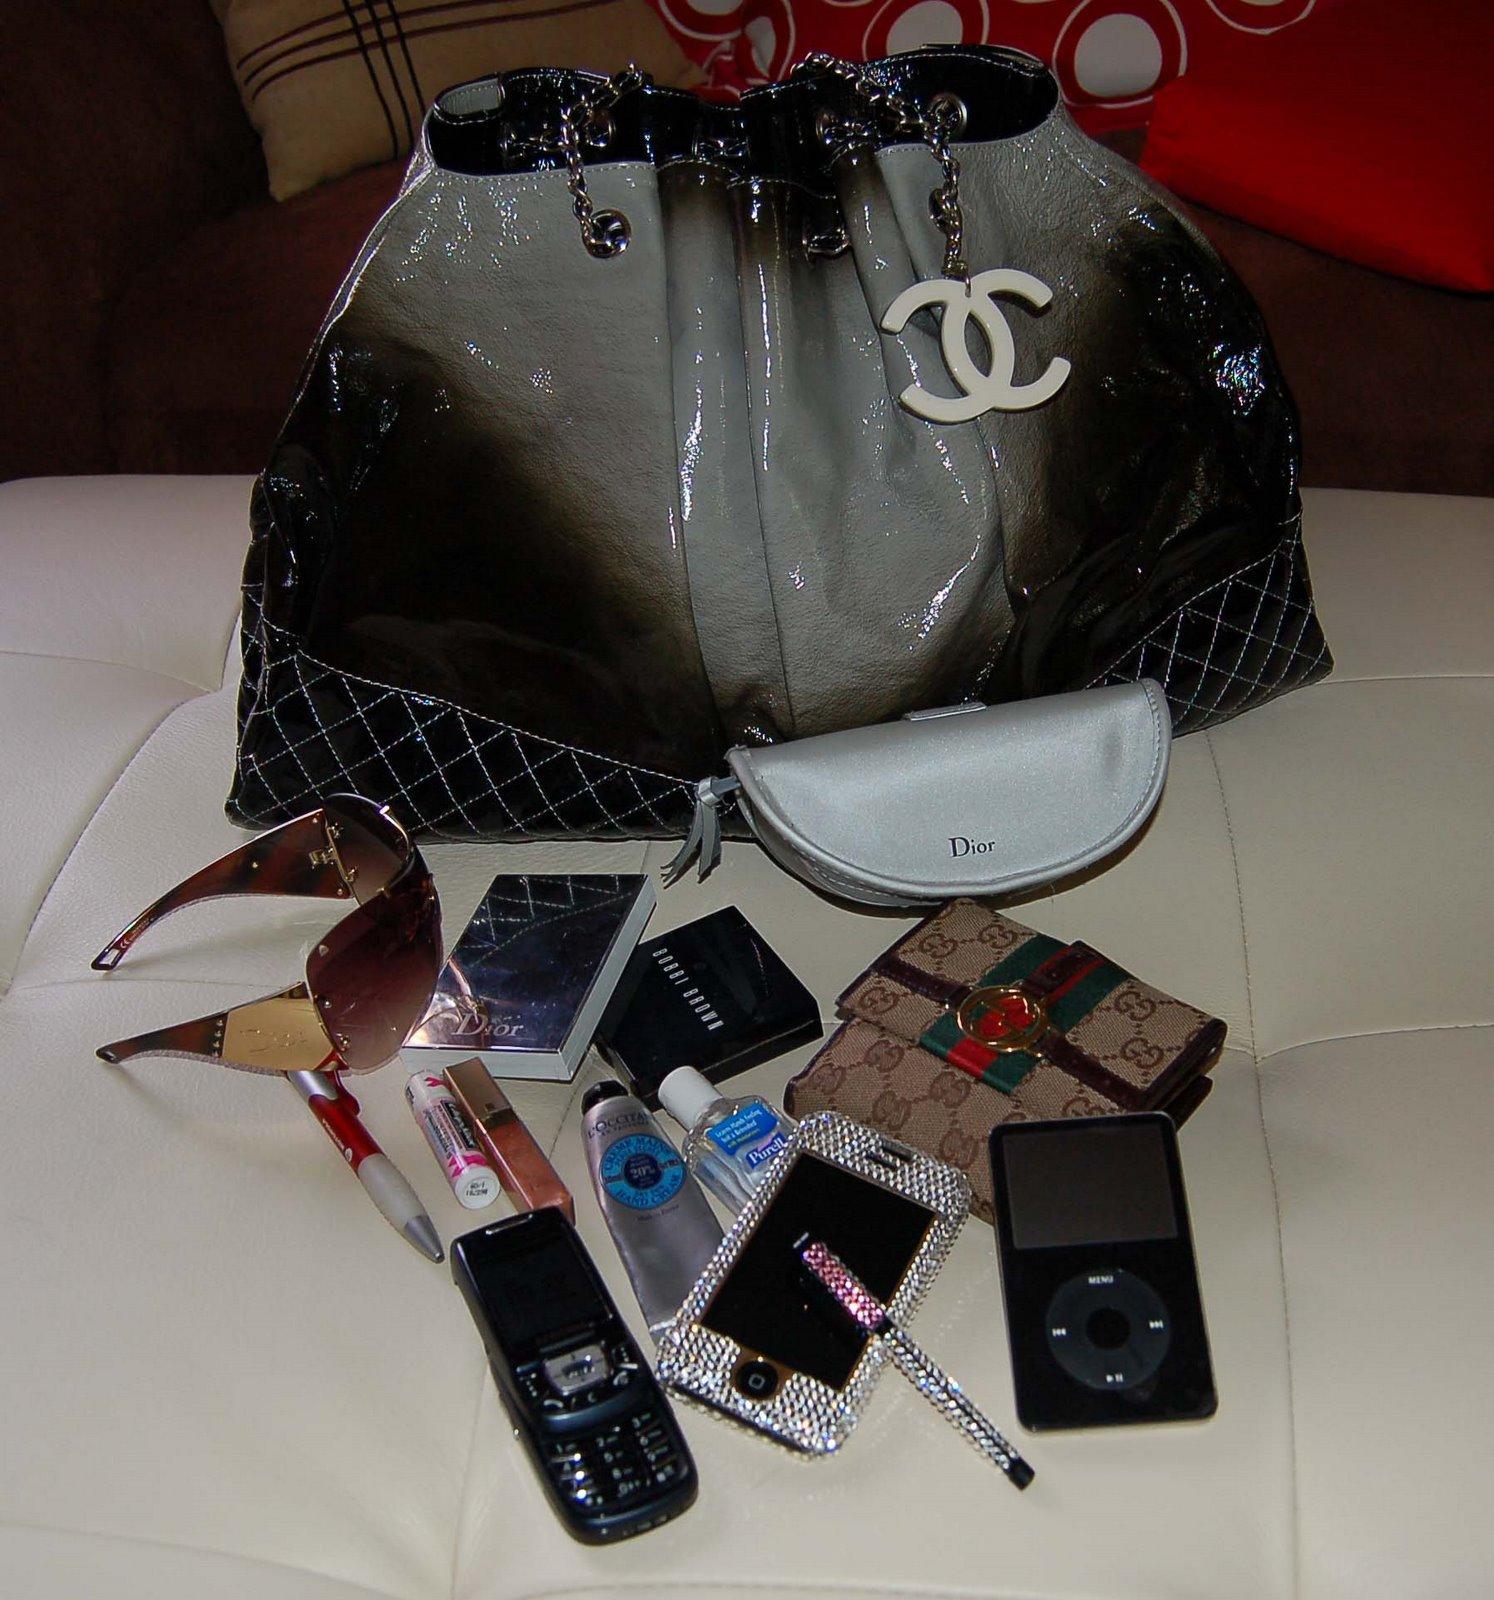 [Chanel+Bag+cropped+sz.jpg]